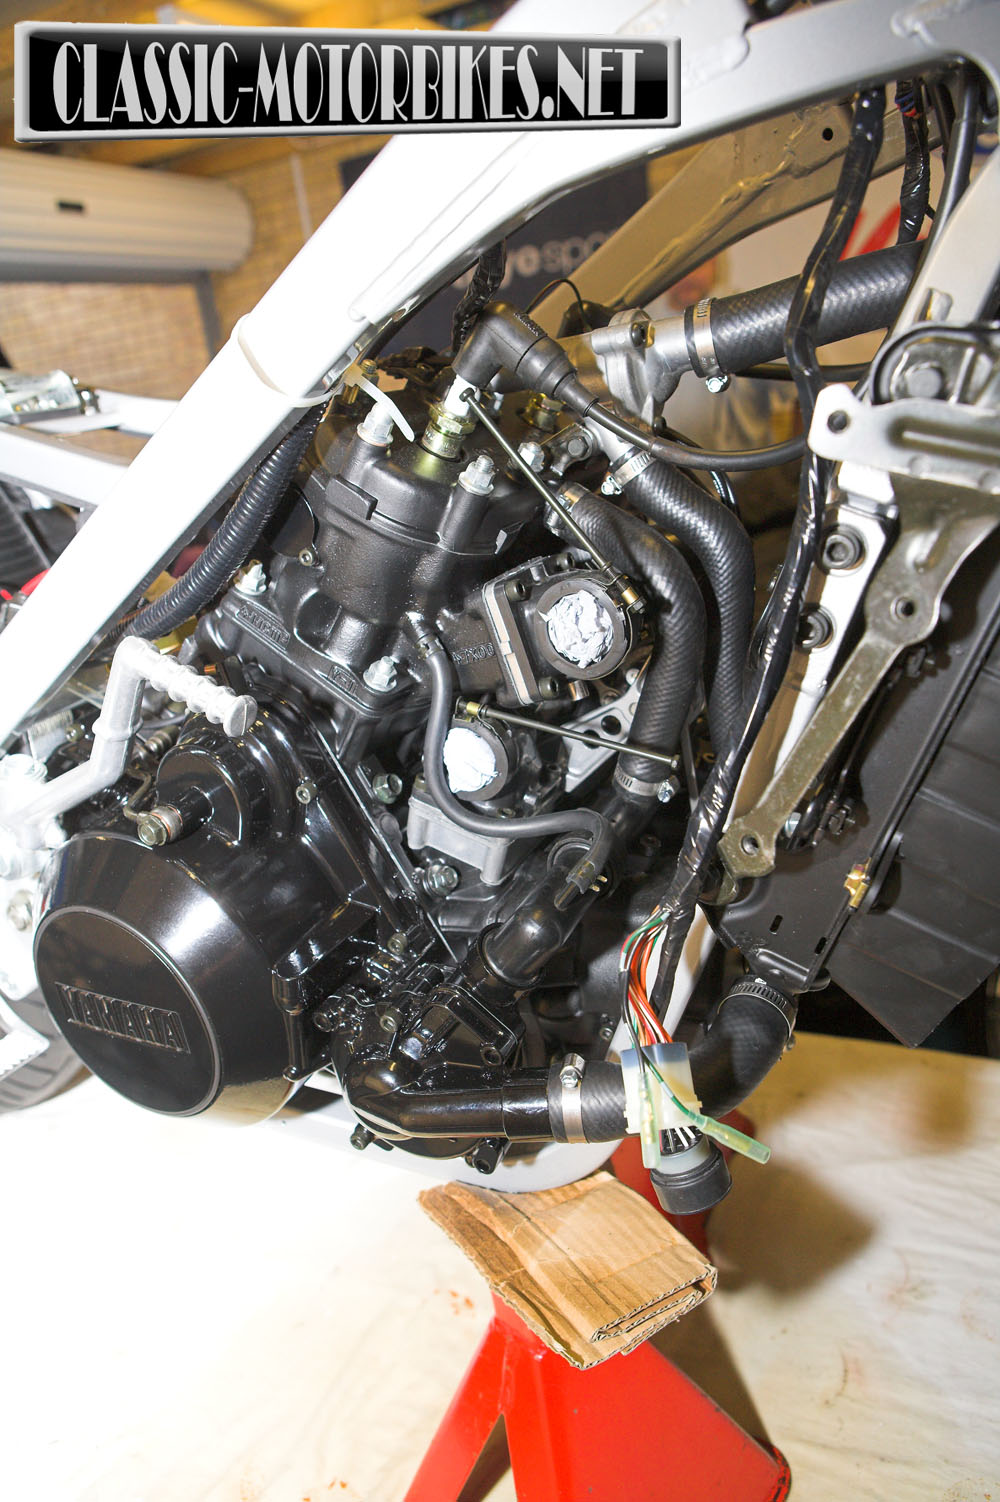 yamaha rd500 lc restoration classic motorbikes rh classic motorbikes net yamaha rz 500 service manual Yamaha TZ 750